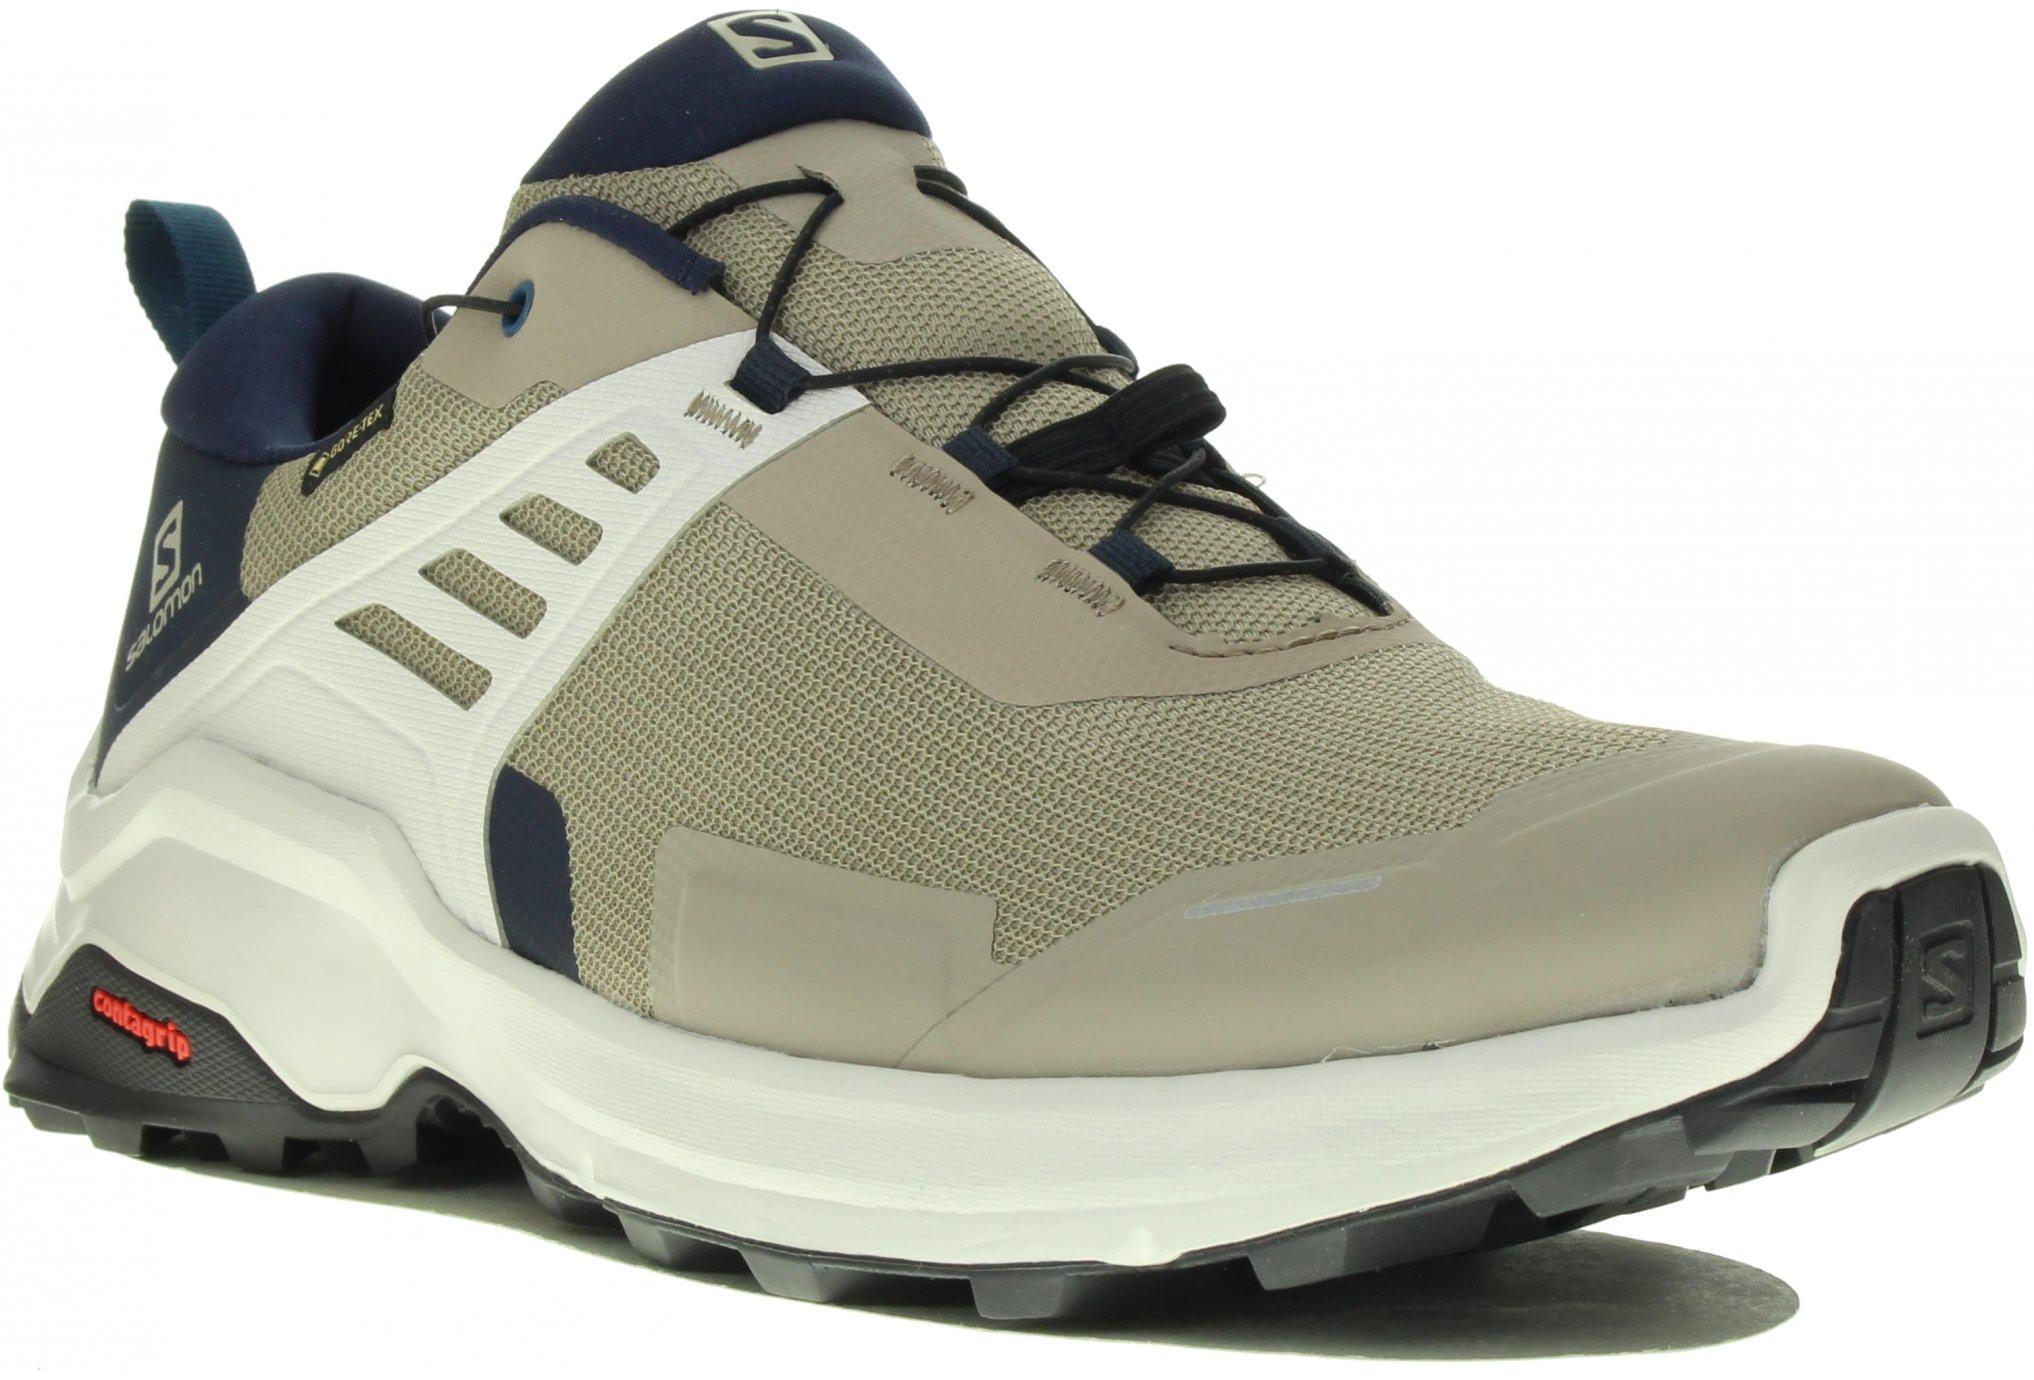 Salomon X Raise Gore-Tex Chaussures homme